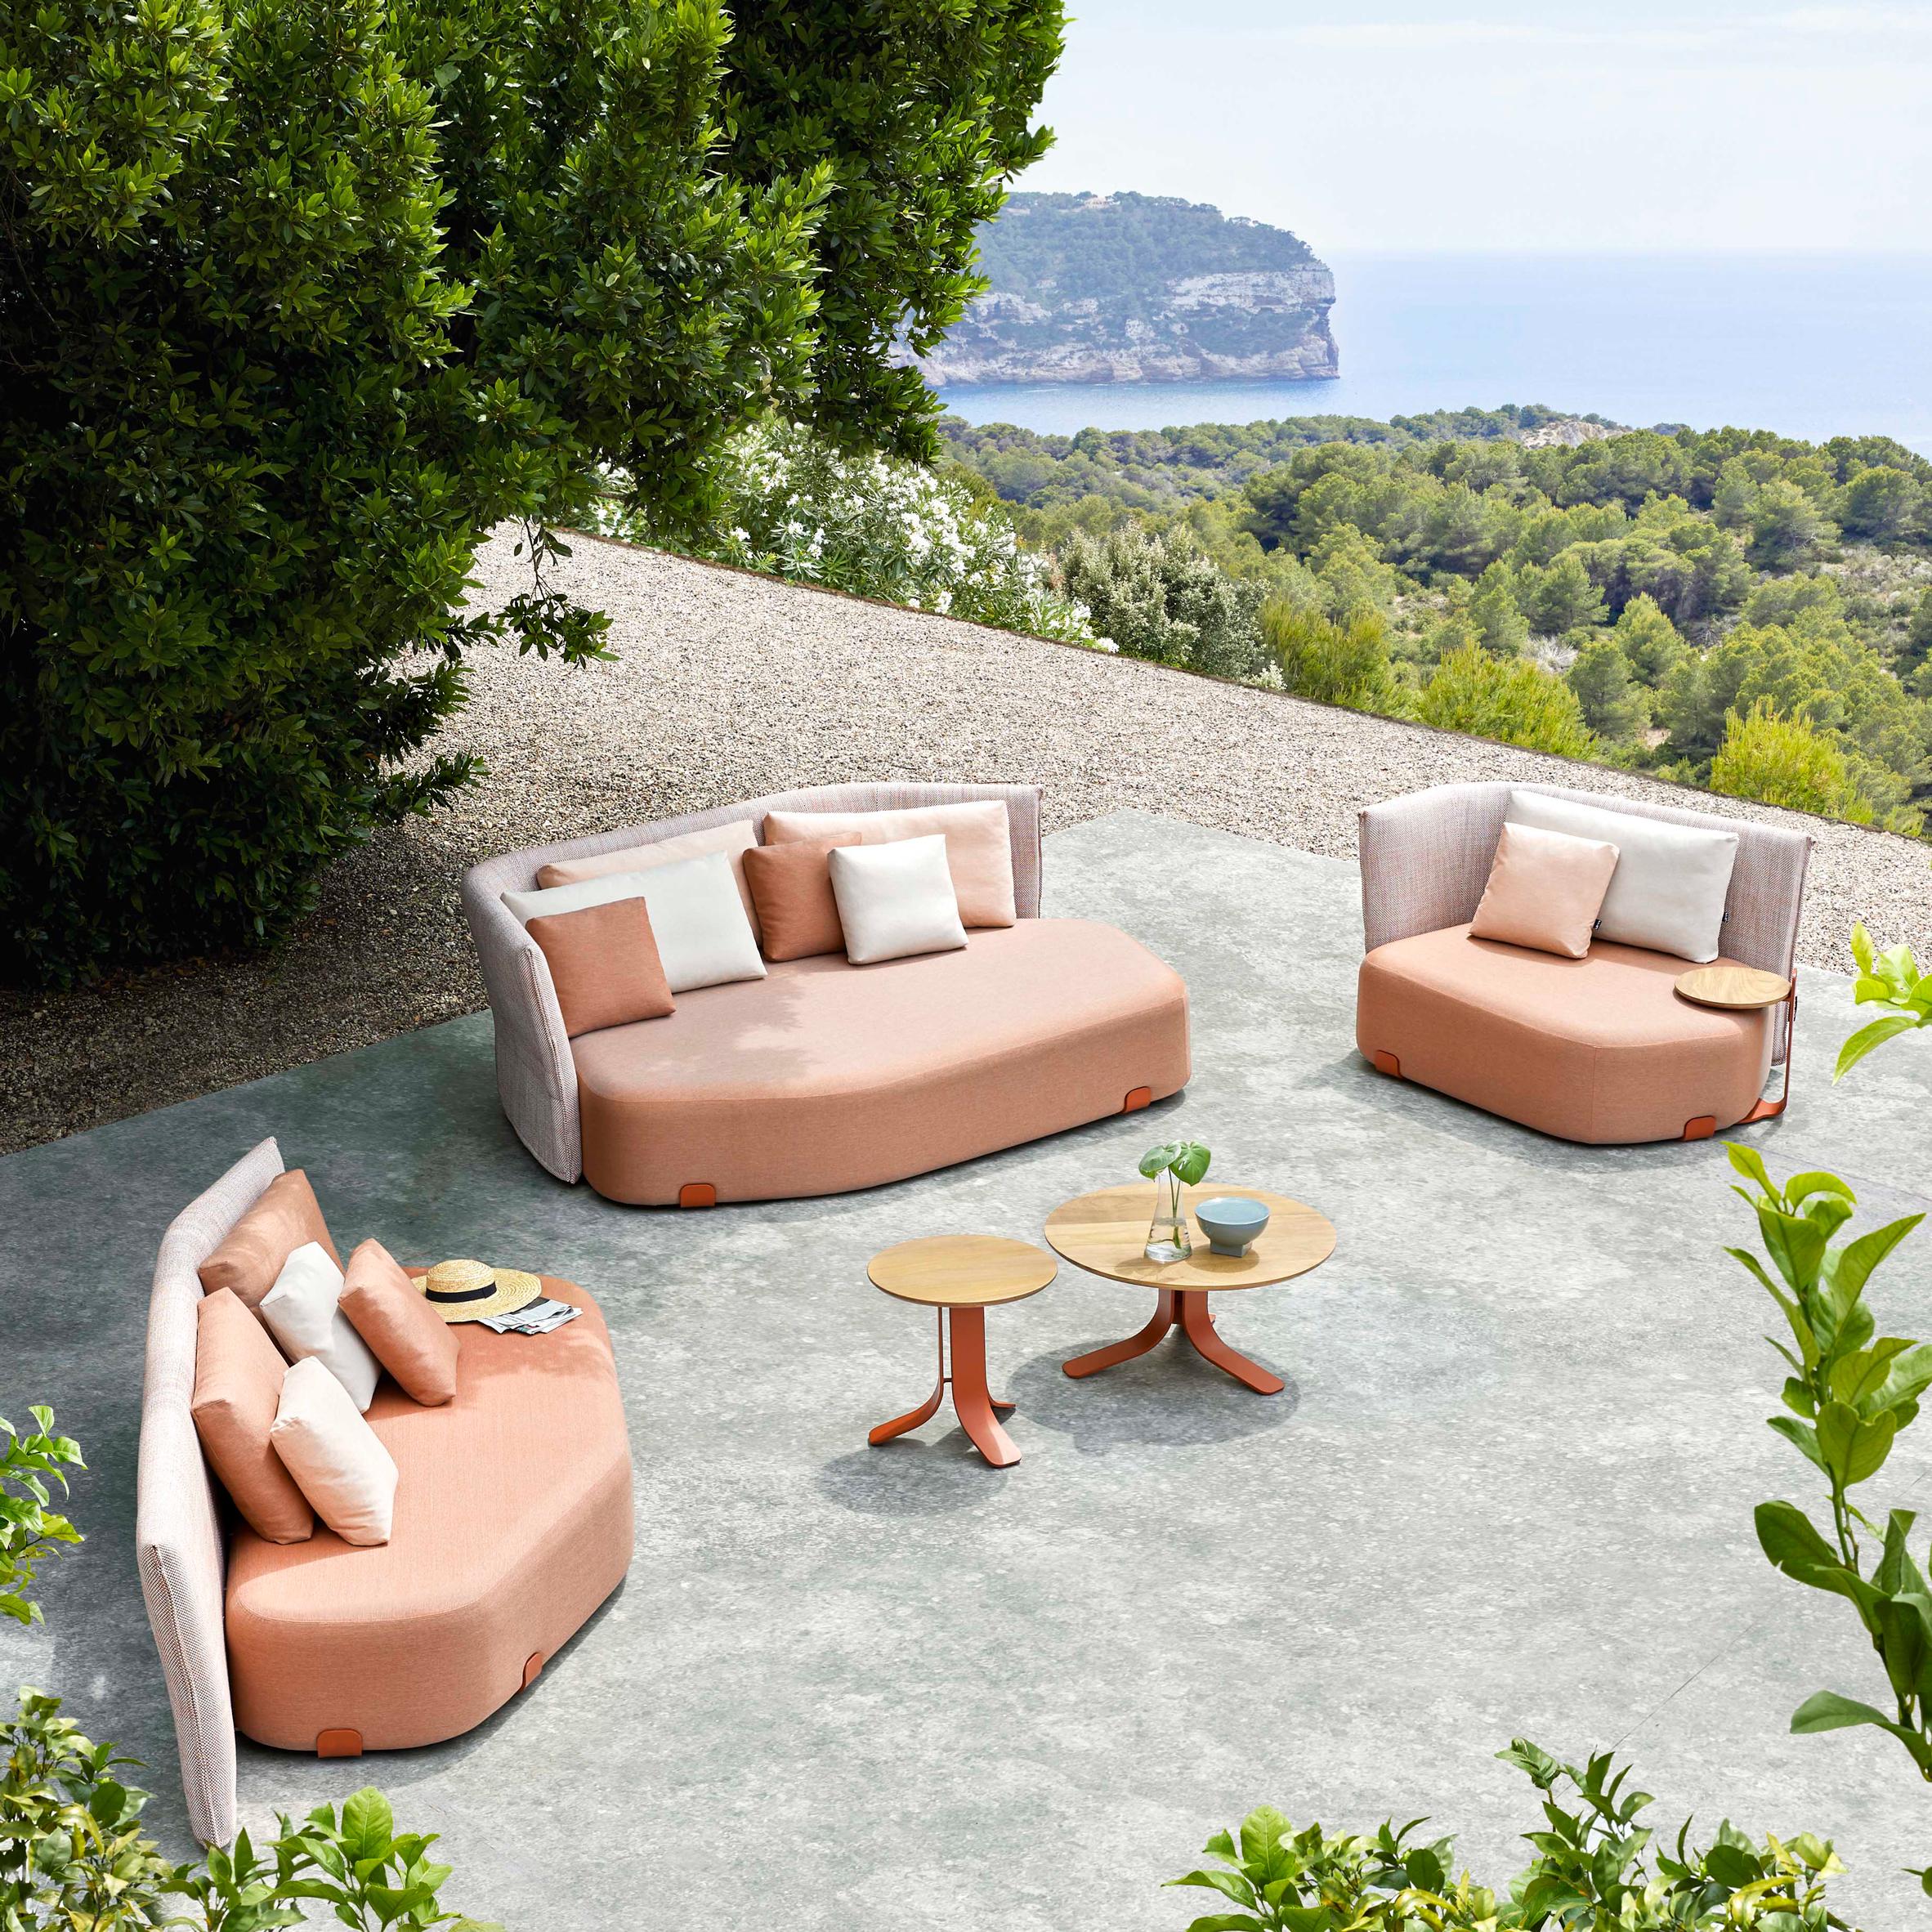 Isla outdoor seating by Sebastian Herkner for Gan